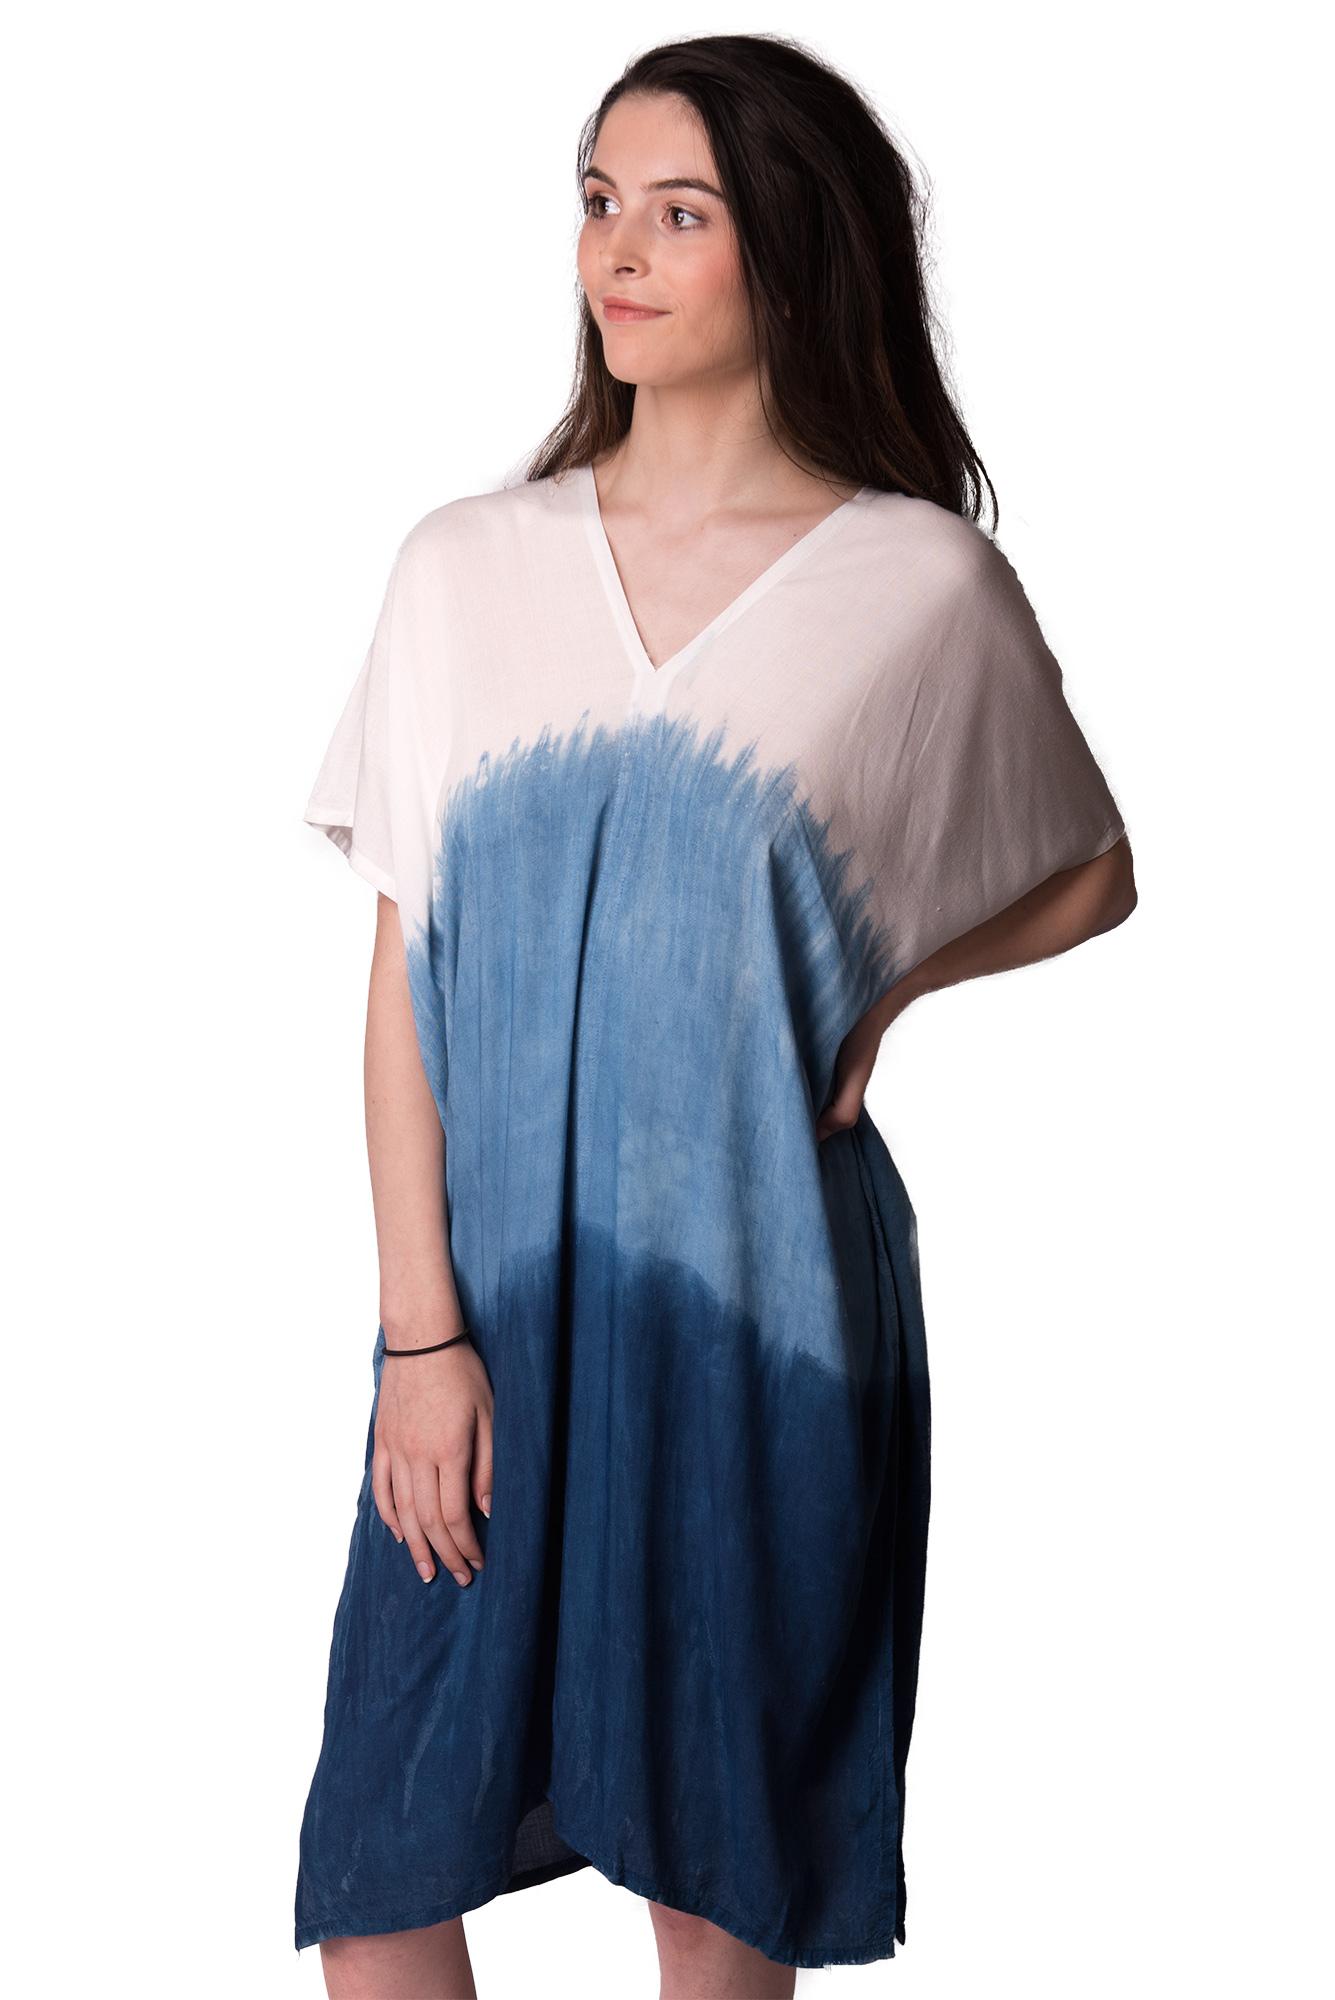 indigo V-neck dress-4510-IS